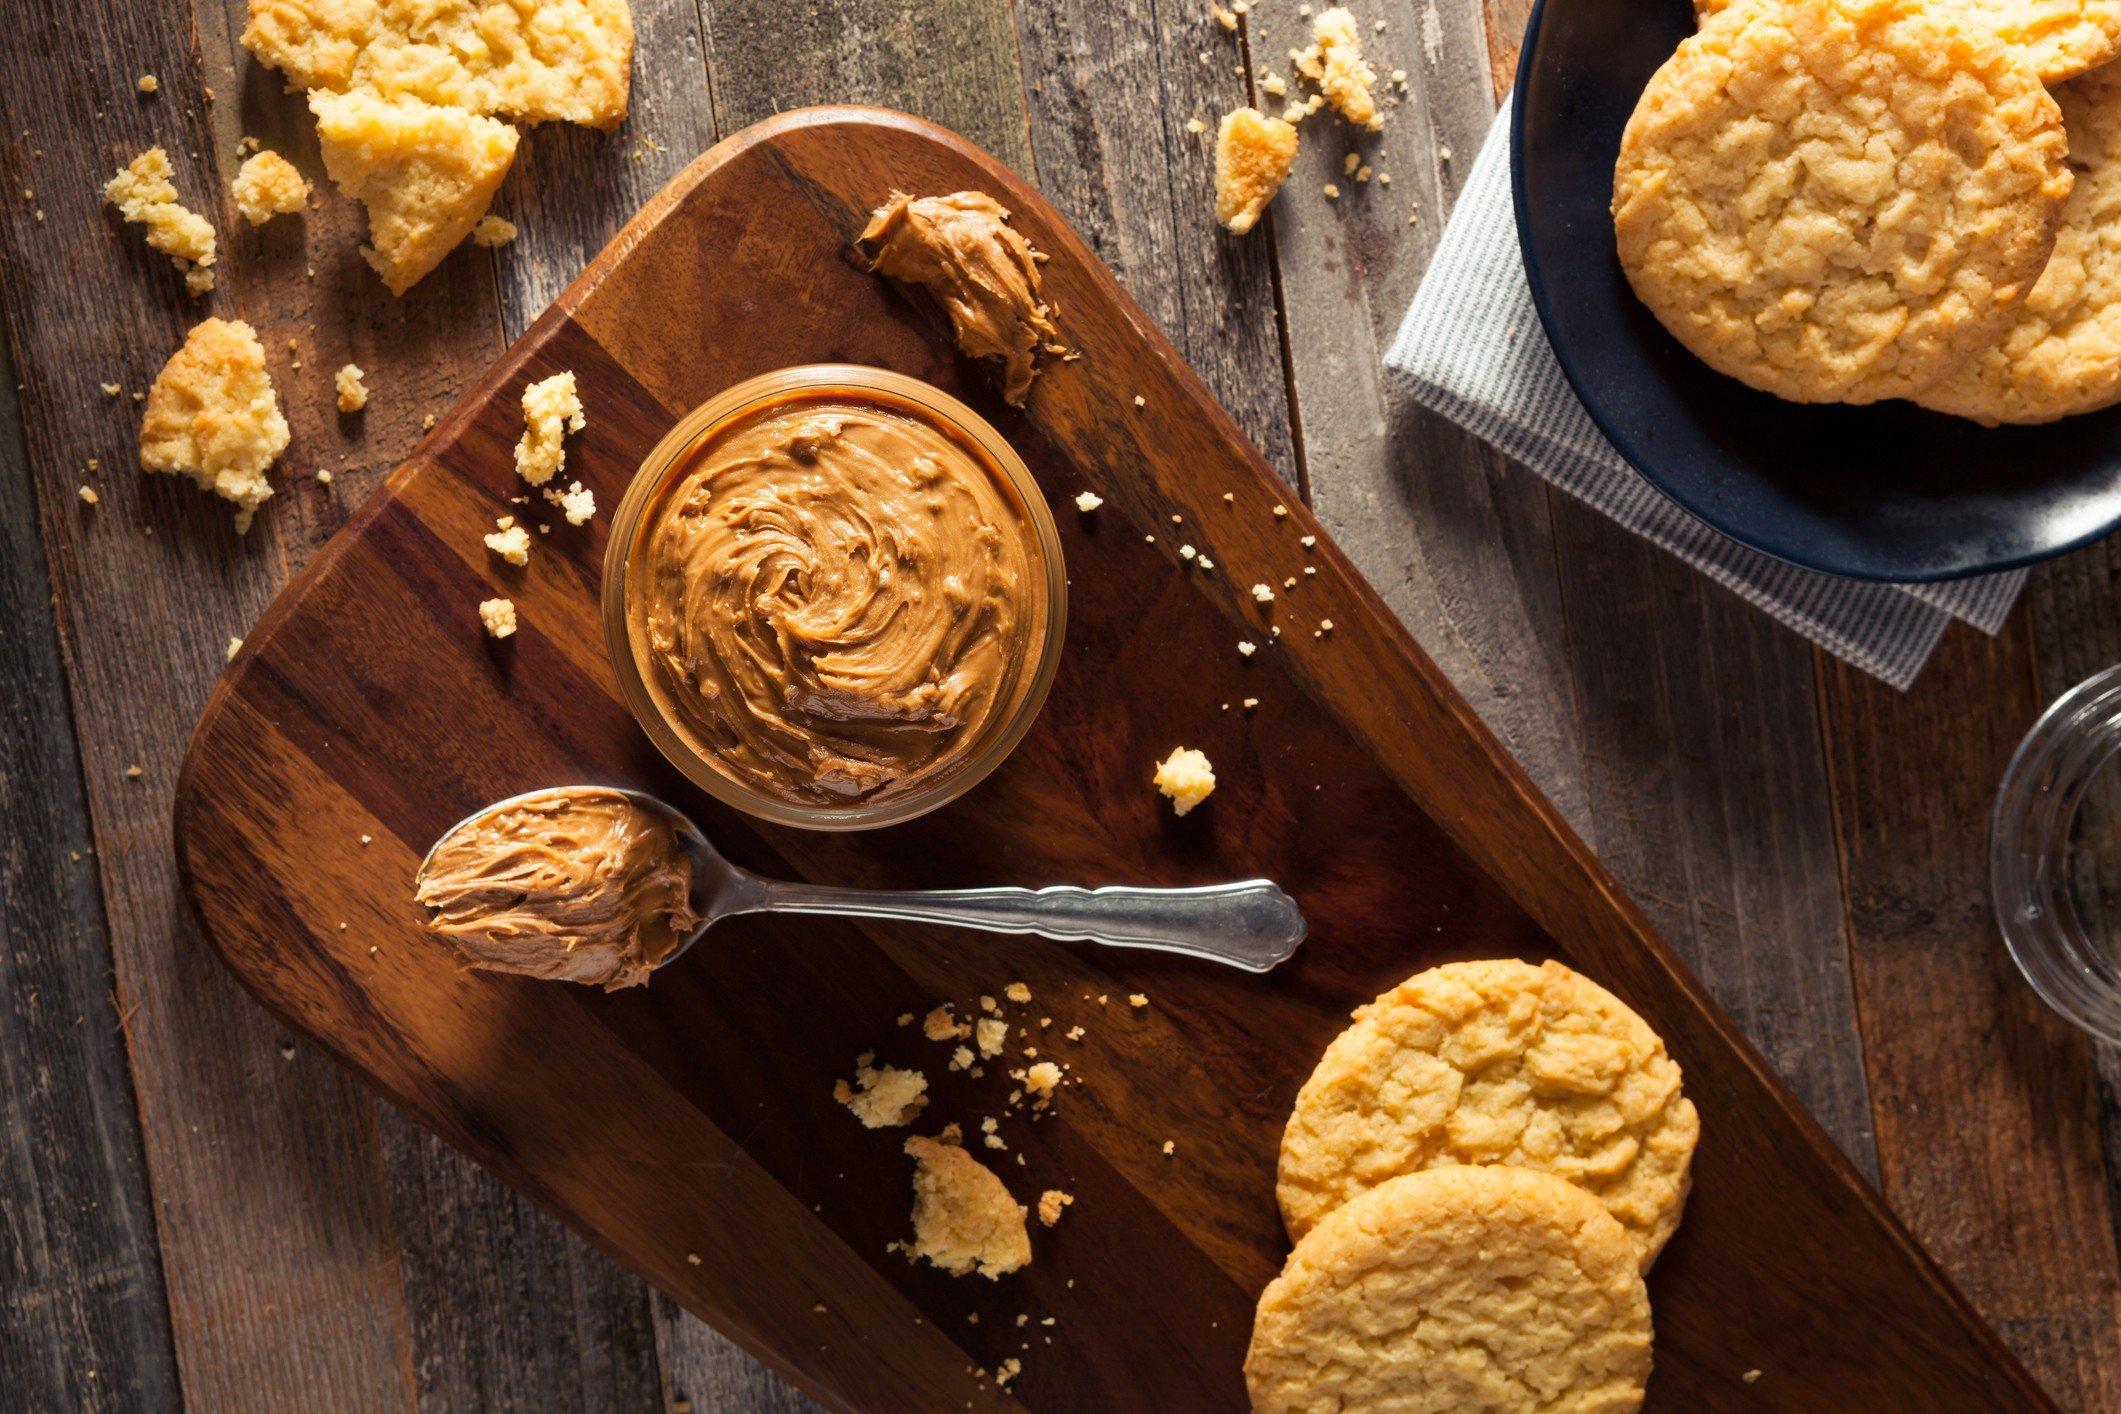 Die weltbesten Erdnussbutter Kekse.jpg